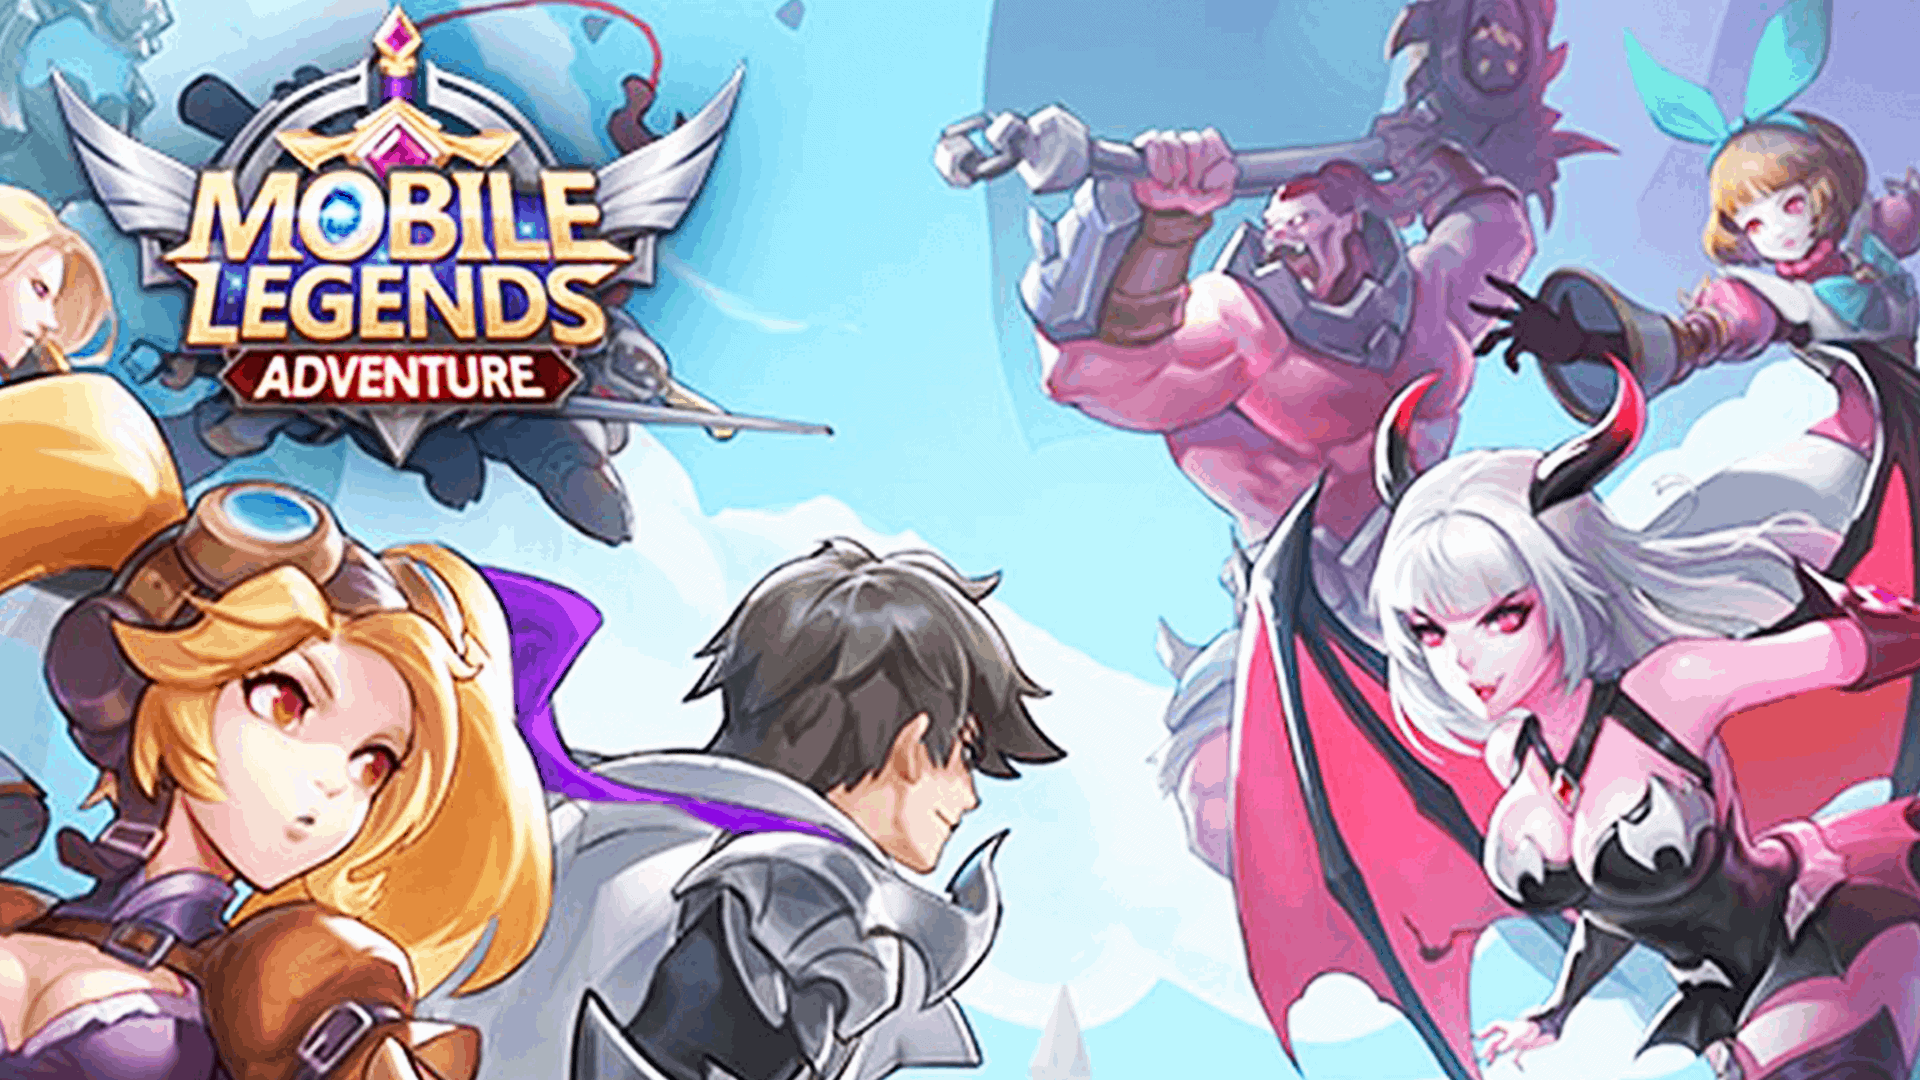 Mobile Legends: Adventure – Best Heroes Tier List (January 2021)